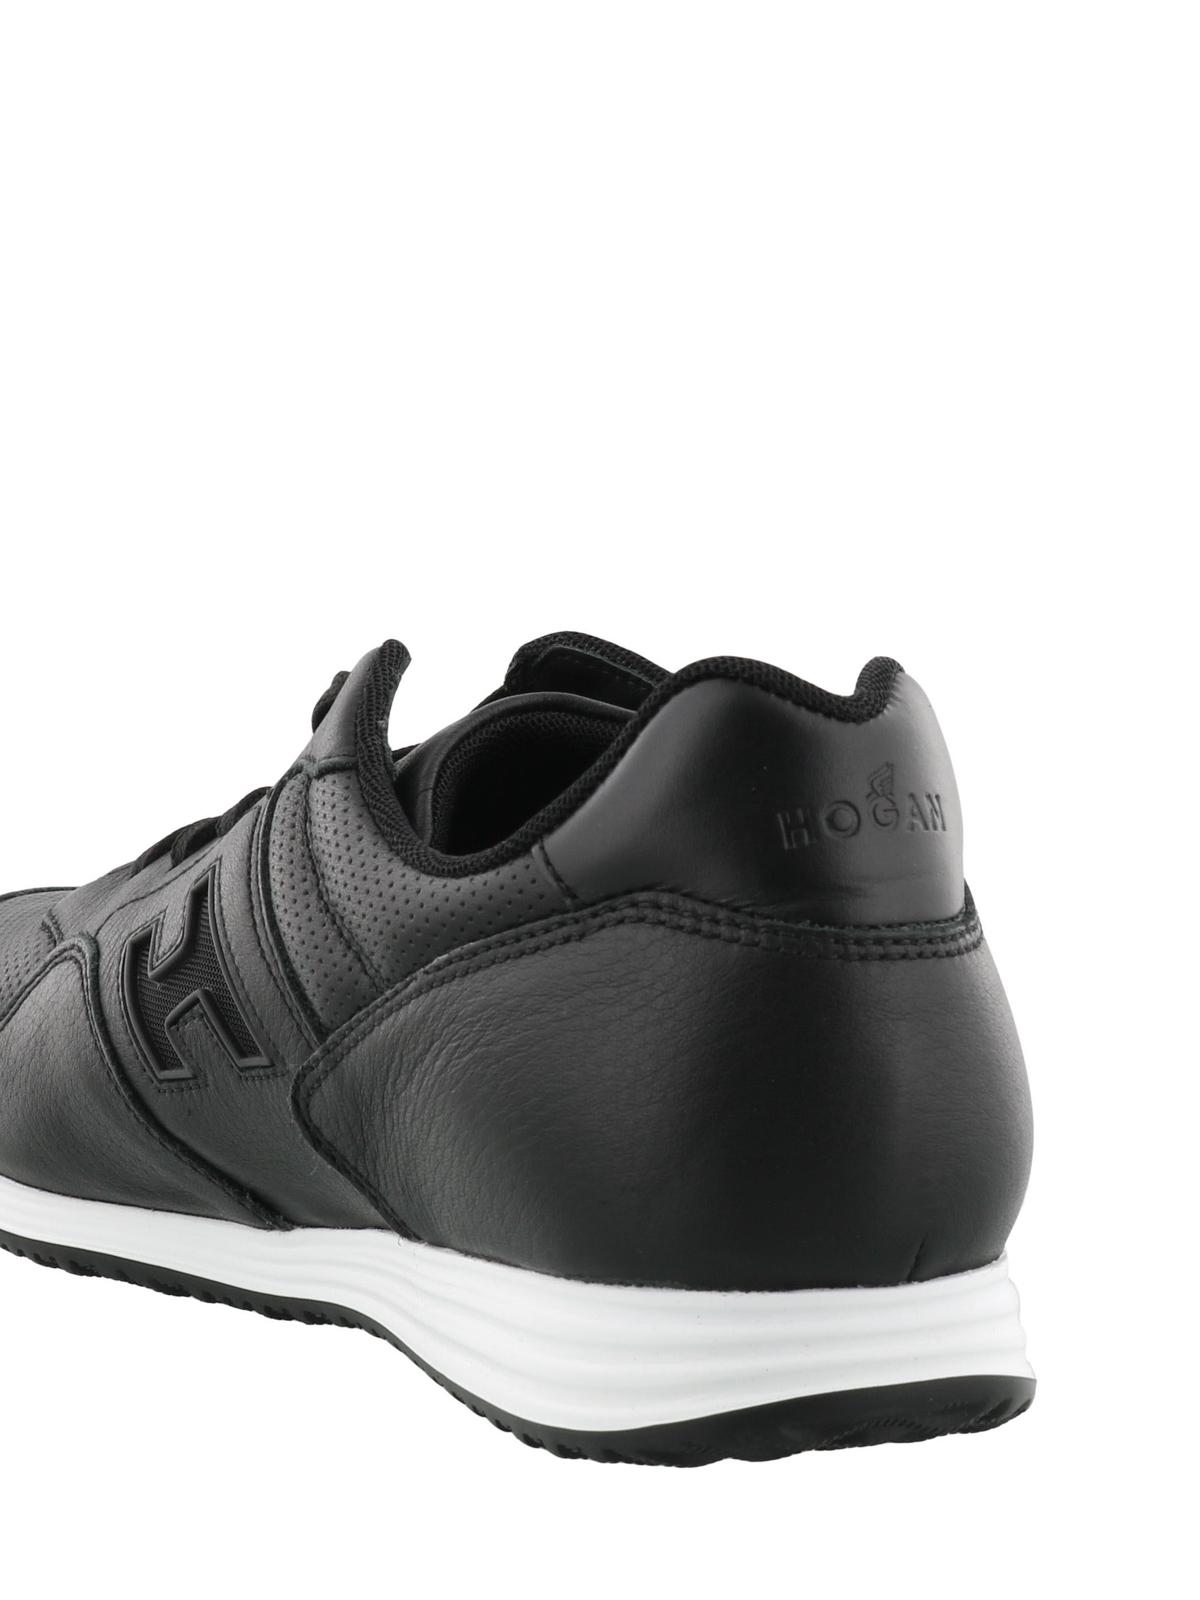 Hogan - Olympia X-H205 black sneakers - trainers - HXM2050X593I7M0XCG